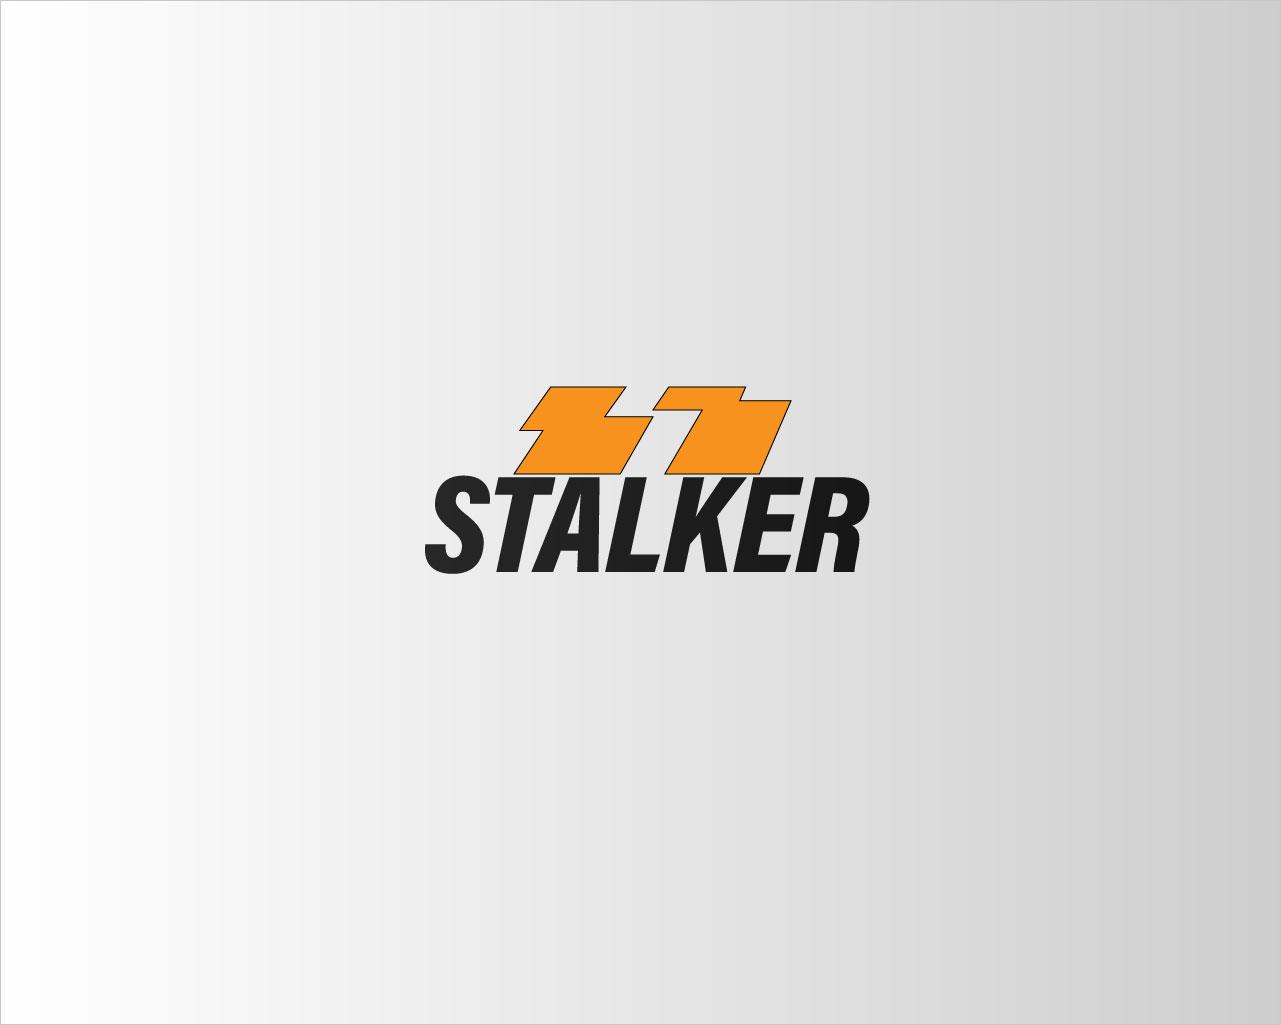 Разработать логотип для вездехода фото f_5675f8d475695fa5.jpg